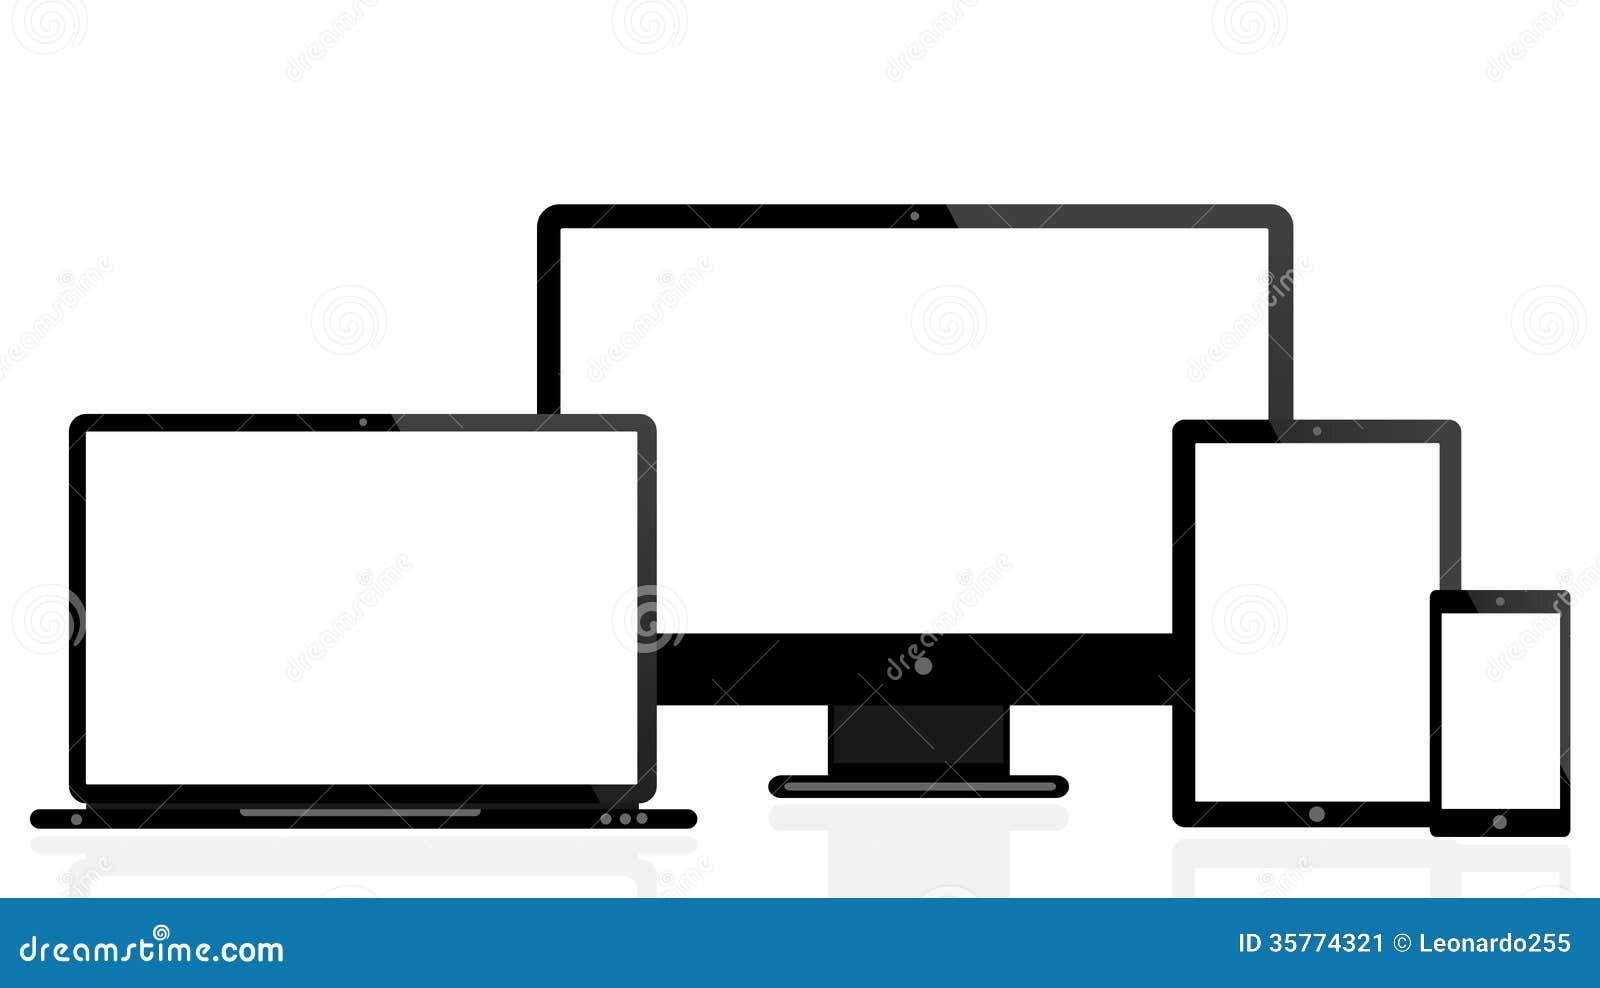 Ноутбук APPLE MacBook Pro 13 Silver MPXY2RU/A (Intel Core i5 3.1 GHz/8192Mb/512Gb/Intel Iris Plus Graphics 650/Wi-Fi/Bluetooth/Cam/13.3/2560x1600/macOS Sierra)